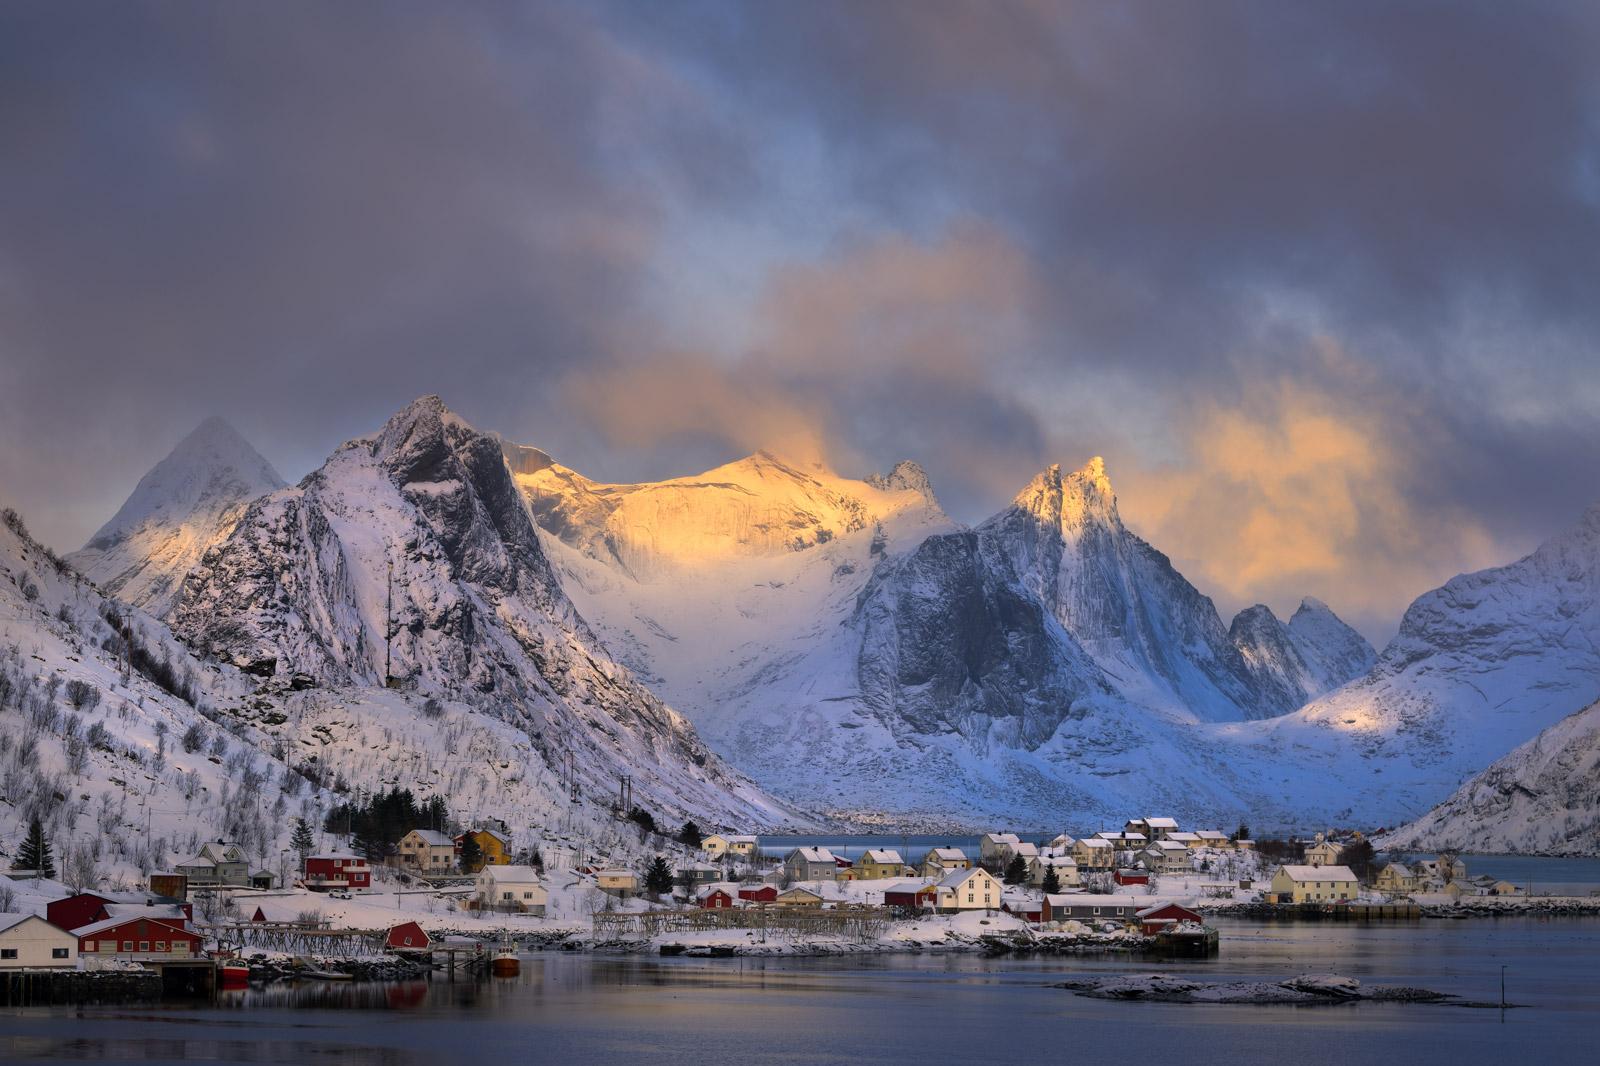 Norway, Lofoten, Hamnoy, Winter, Weather, photo